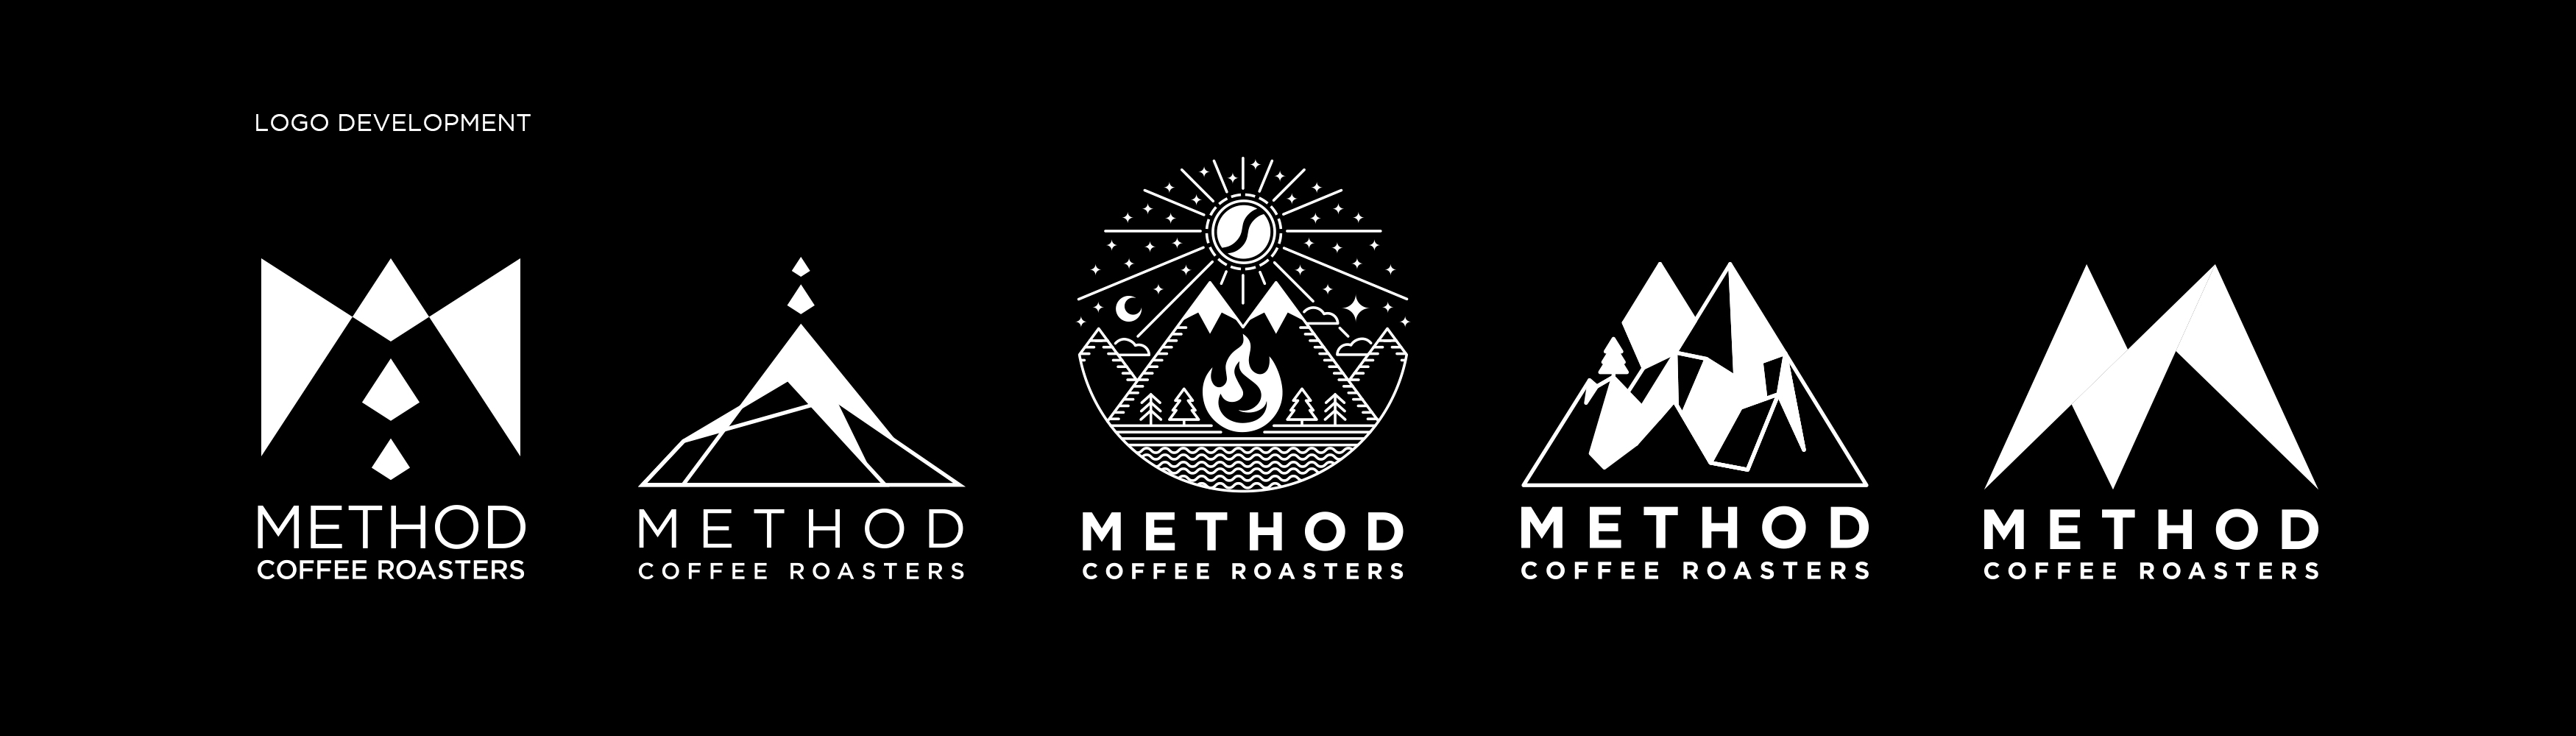 MCR_Logos_01